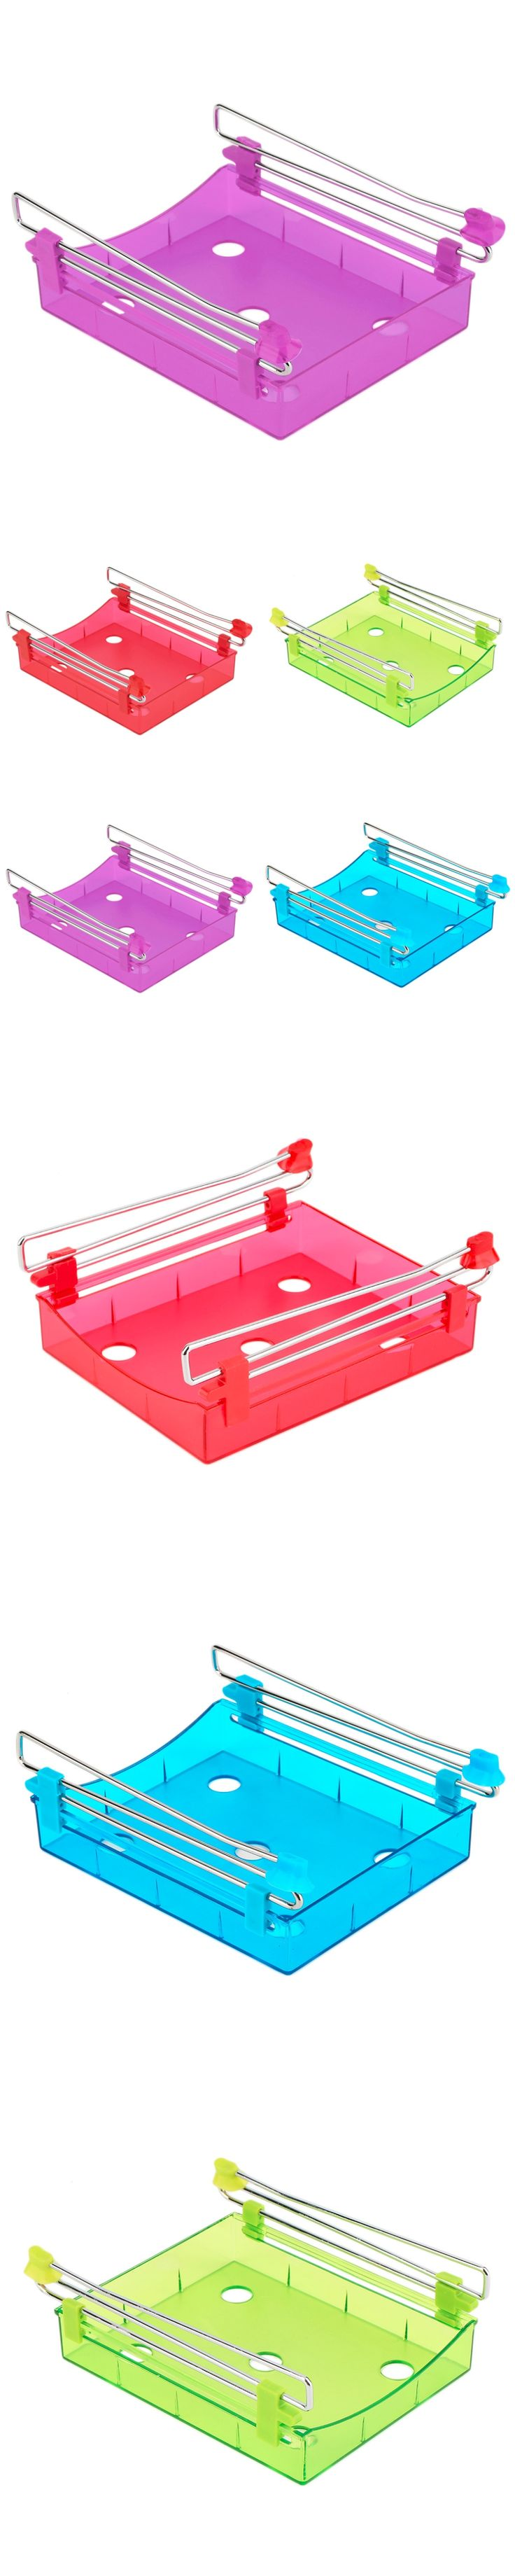 2017 High Quality  Fridge Storage Rack Layer Partition Refrigerator Storage Holder Pull-out Drawer Organizer Kitchen Shelf Rack